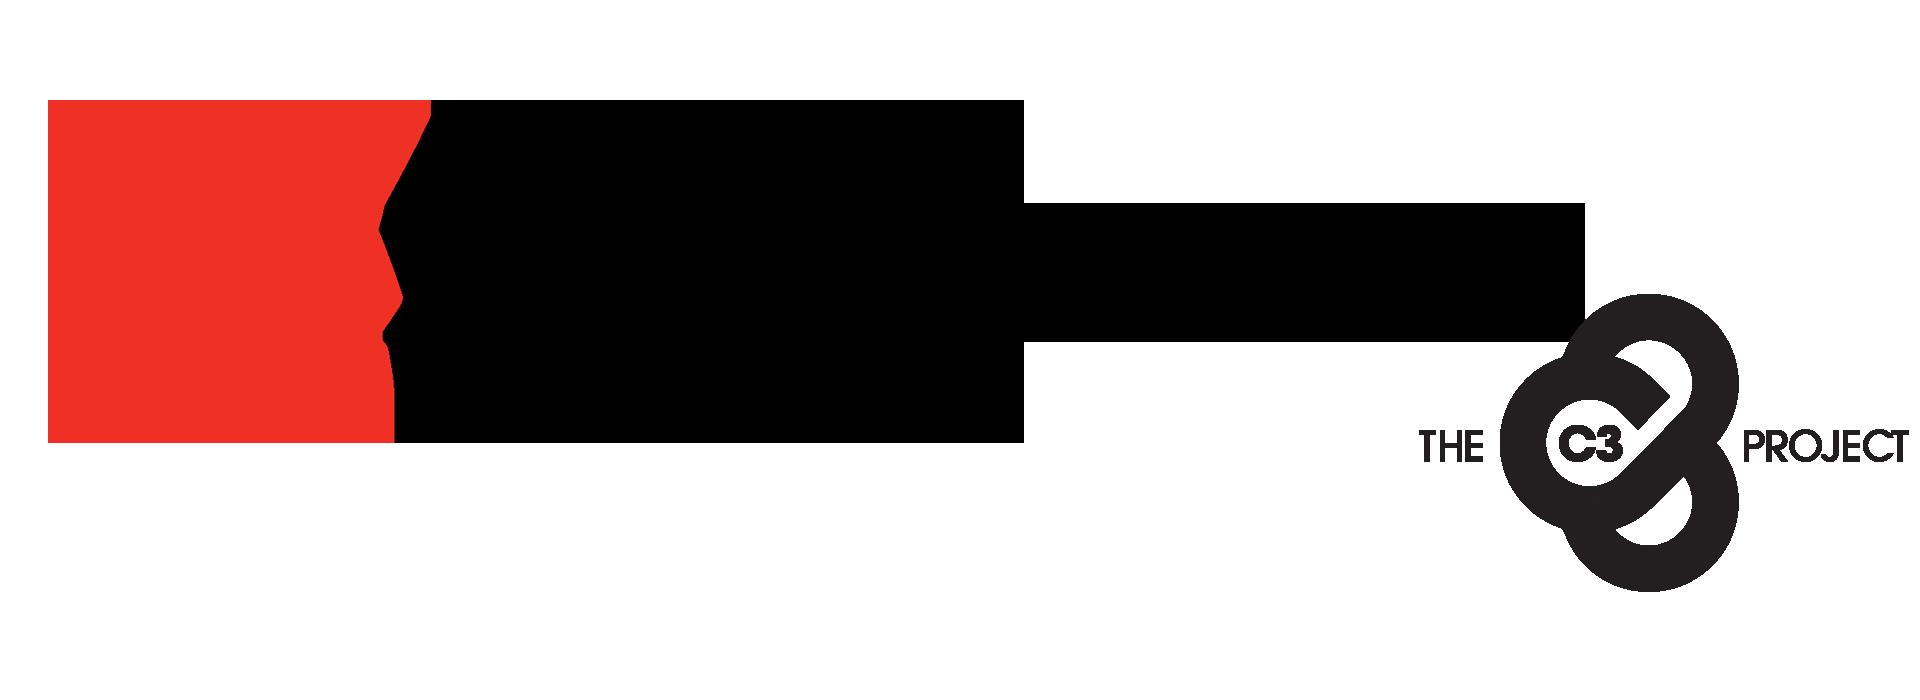 2015 TREK C3